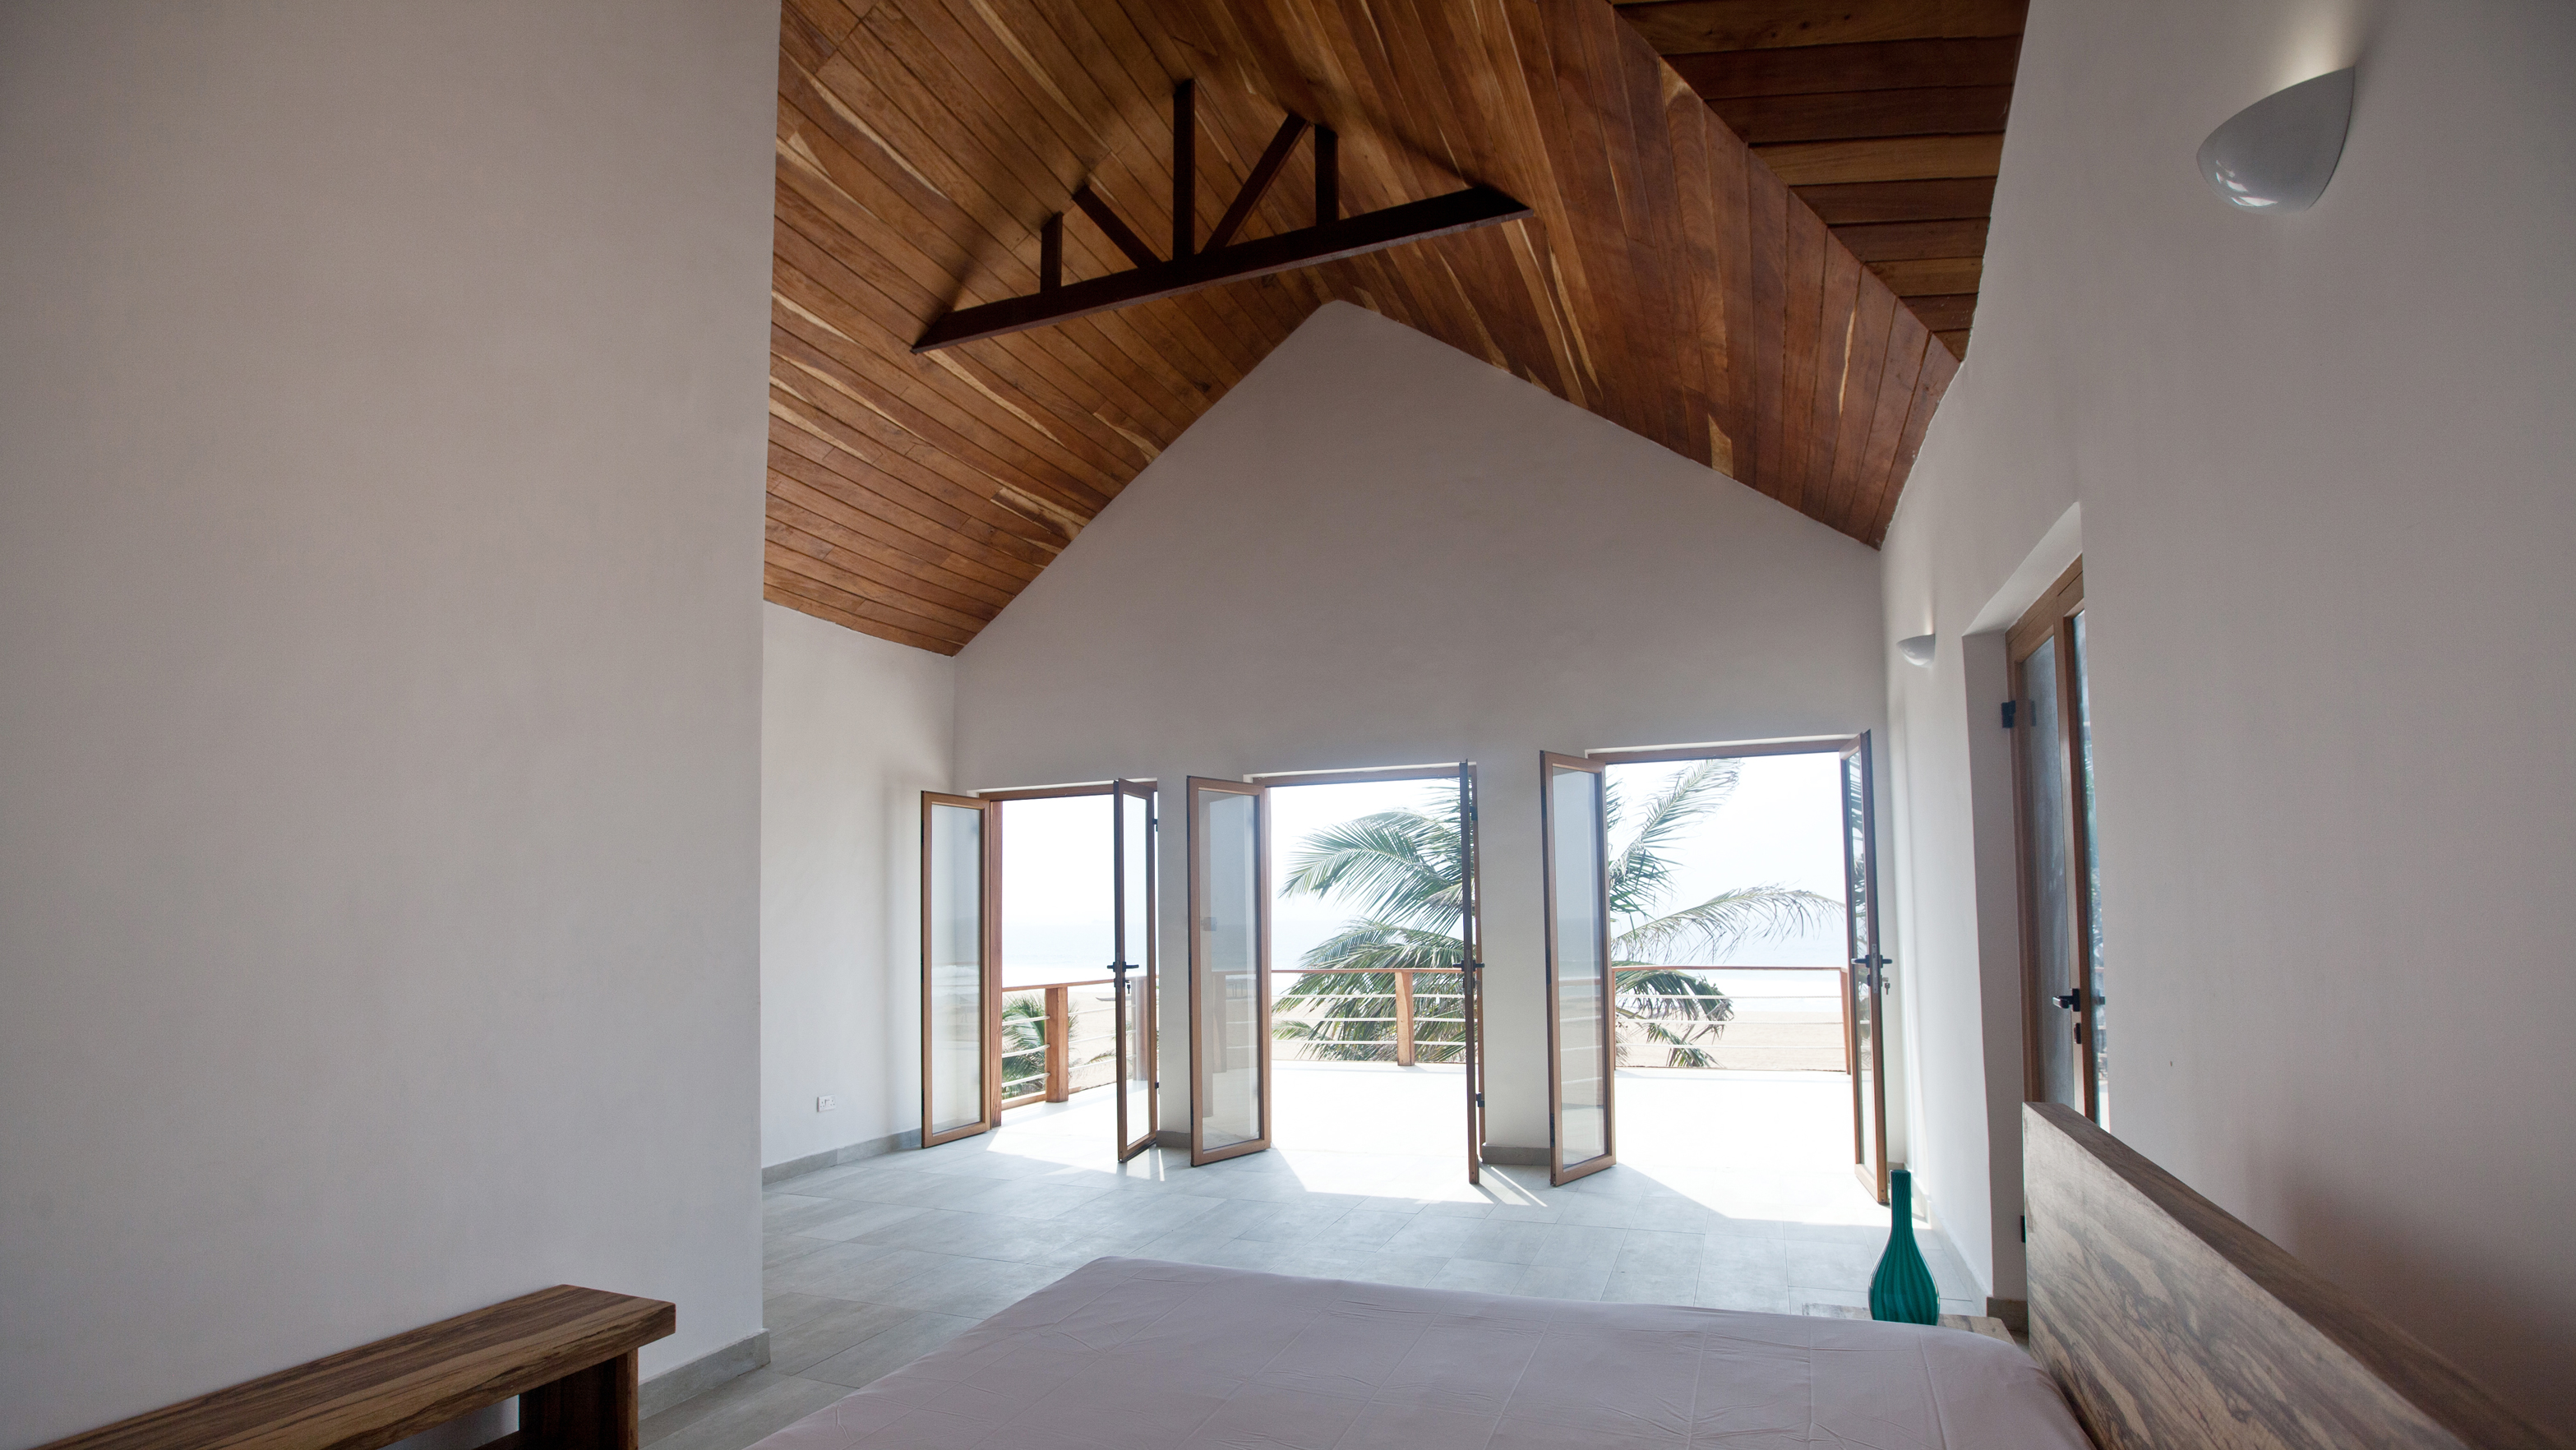 PRIVATE BEACH HOUSE INTERIOR 3